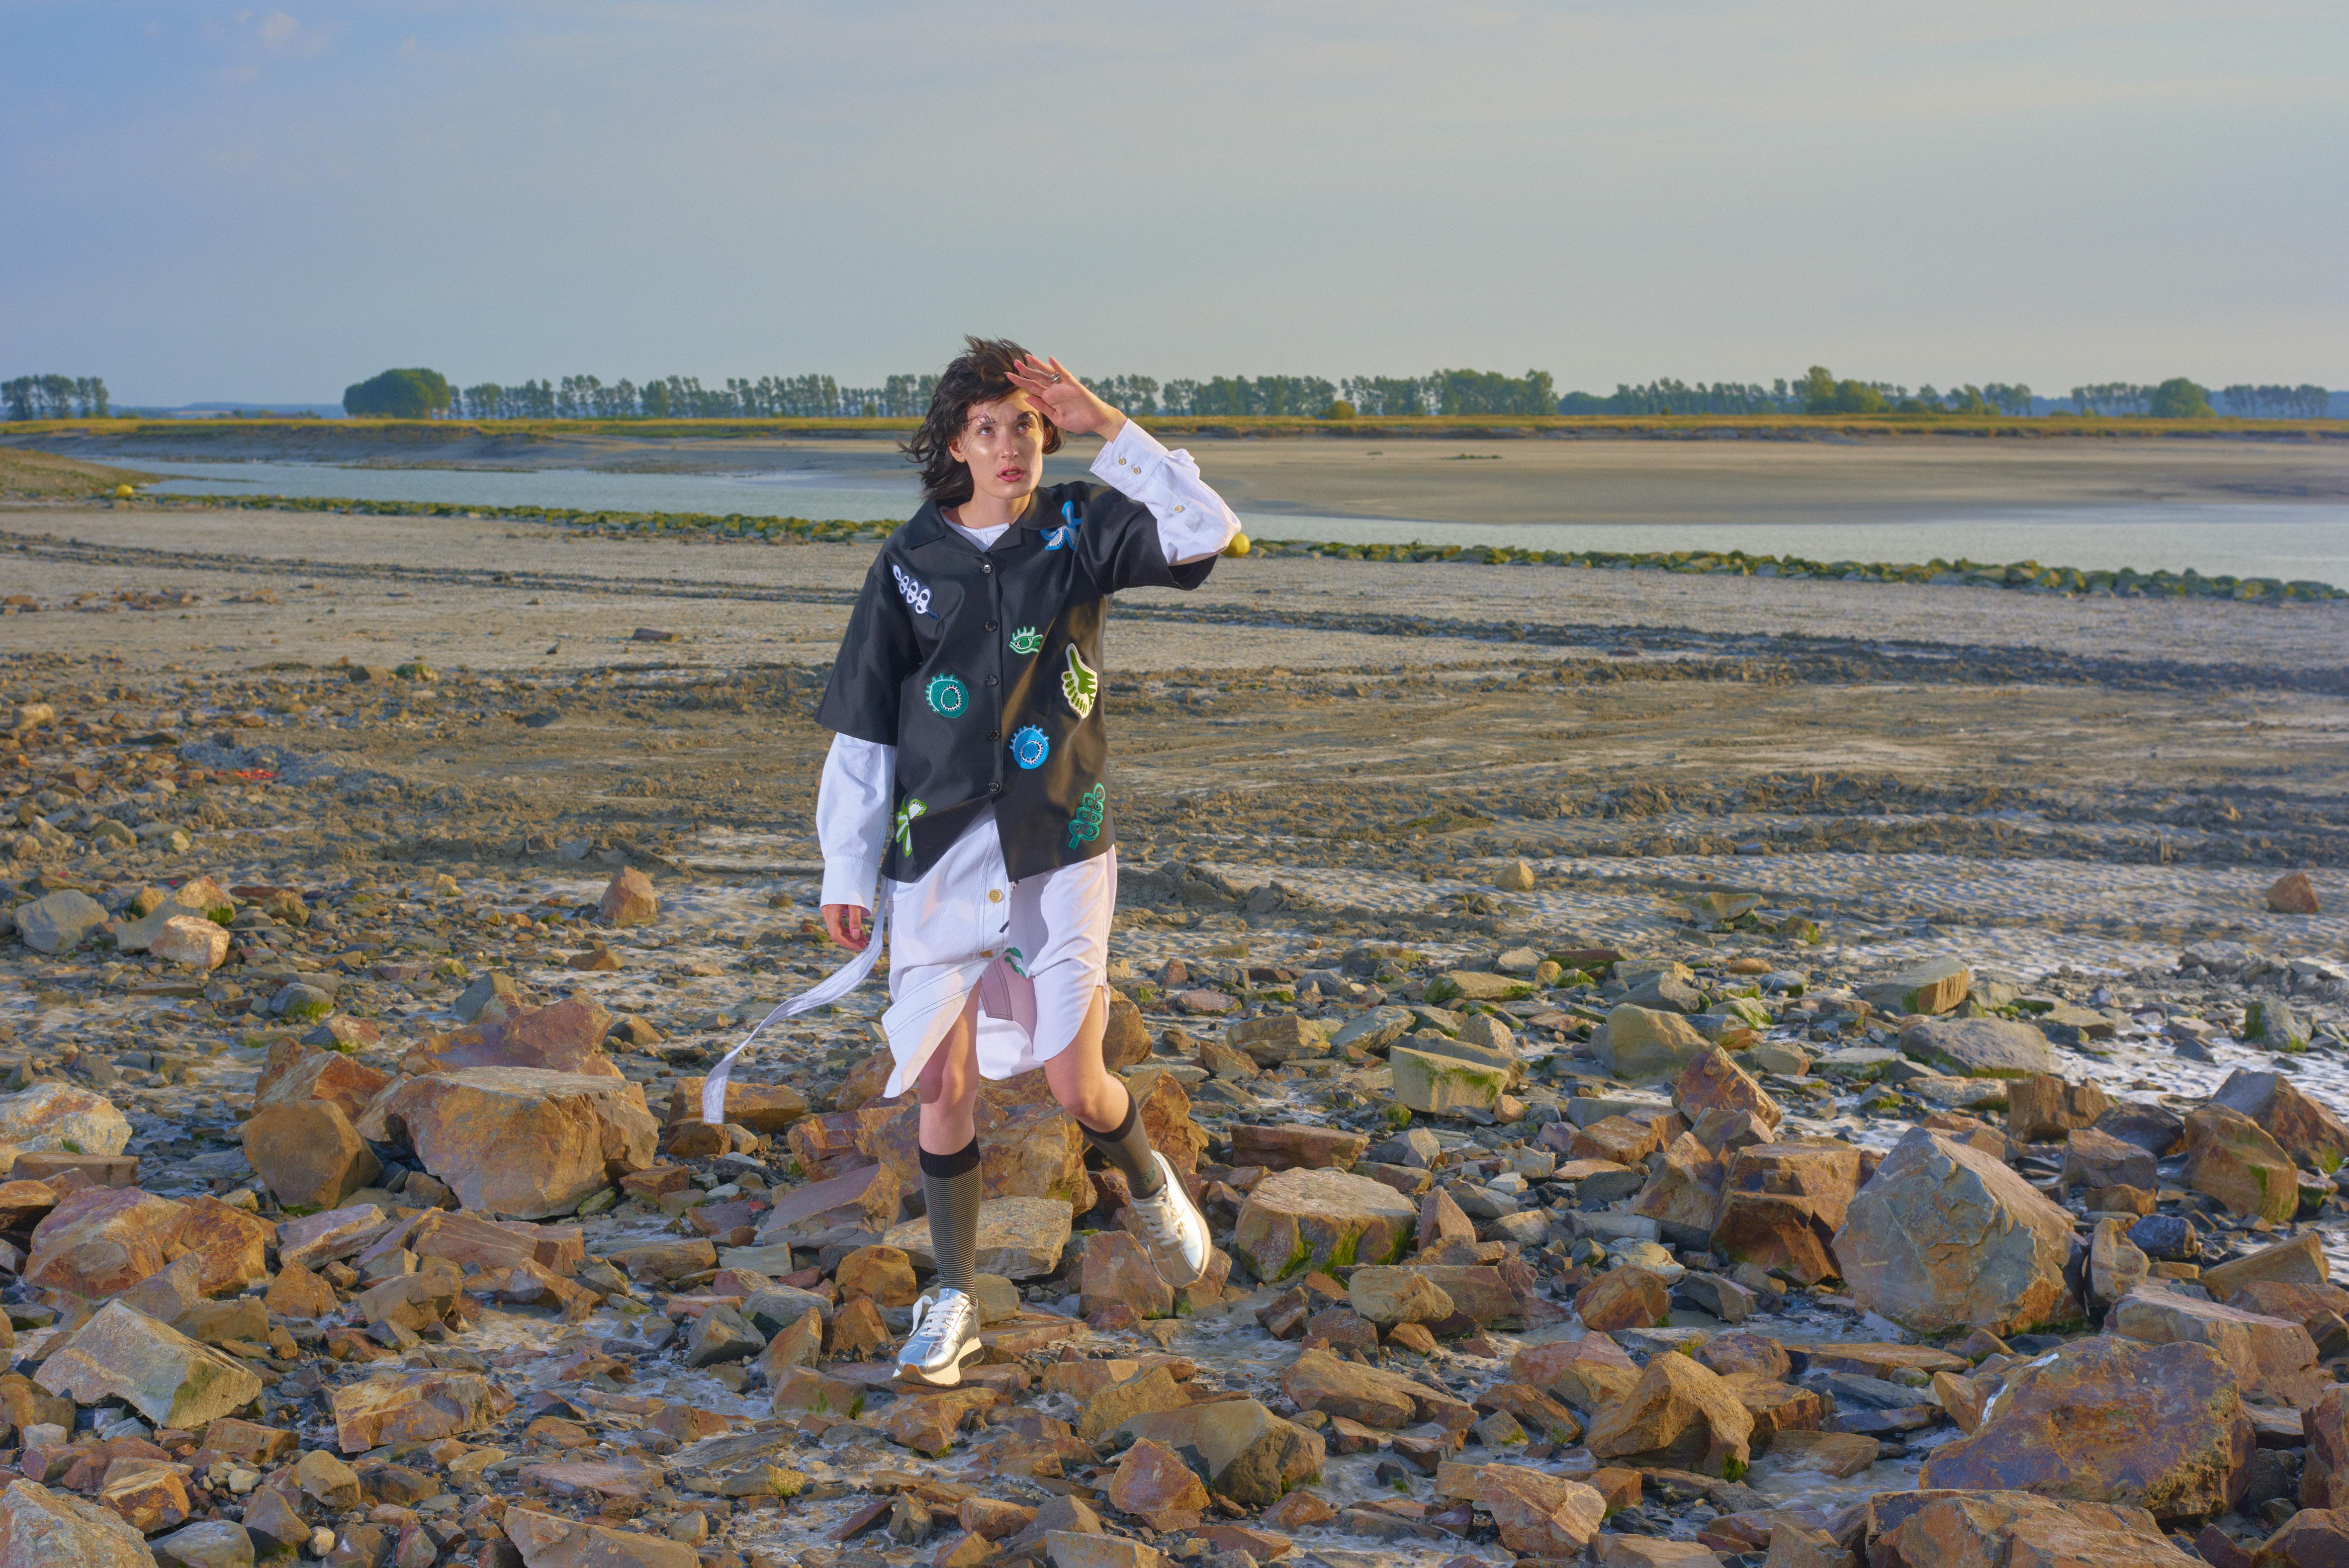 Marni Wandering in Stripes Holiday Campaign by Boris Camaca